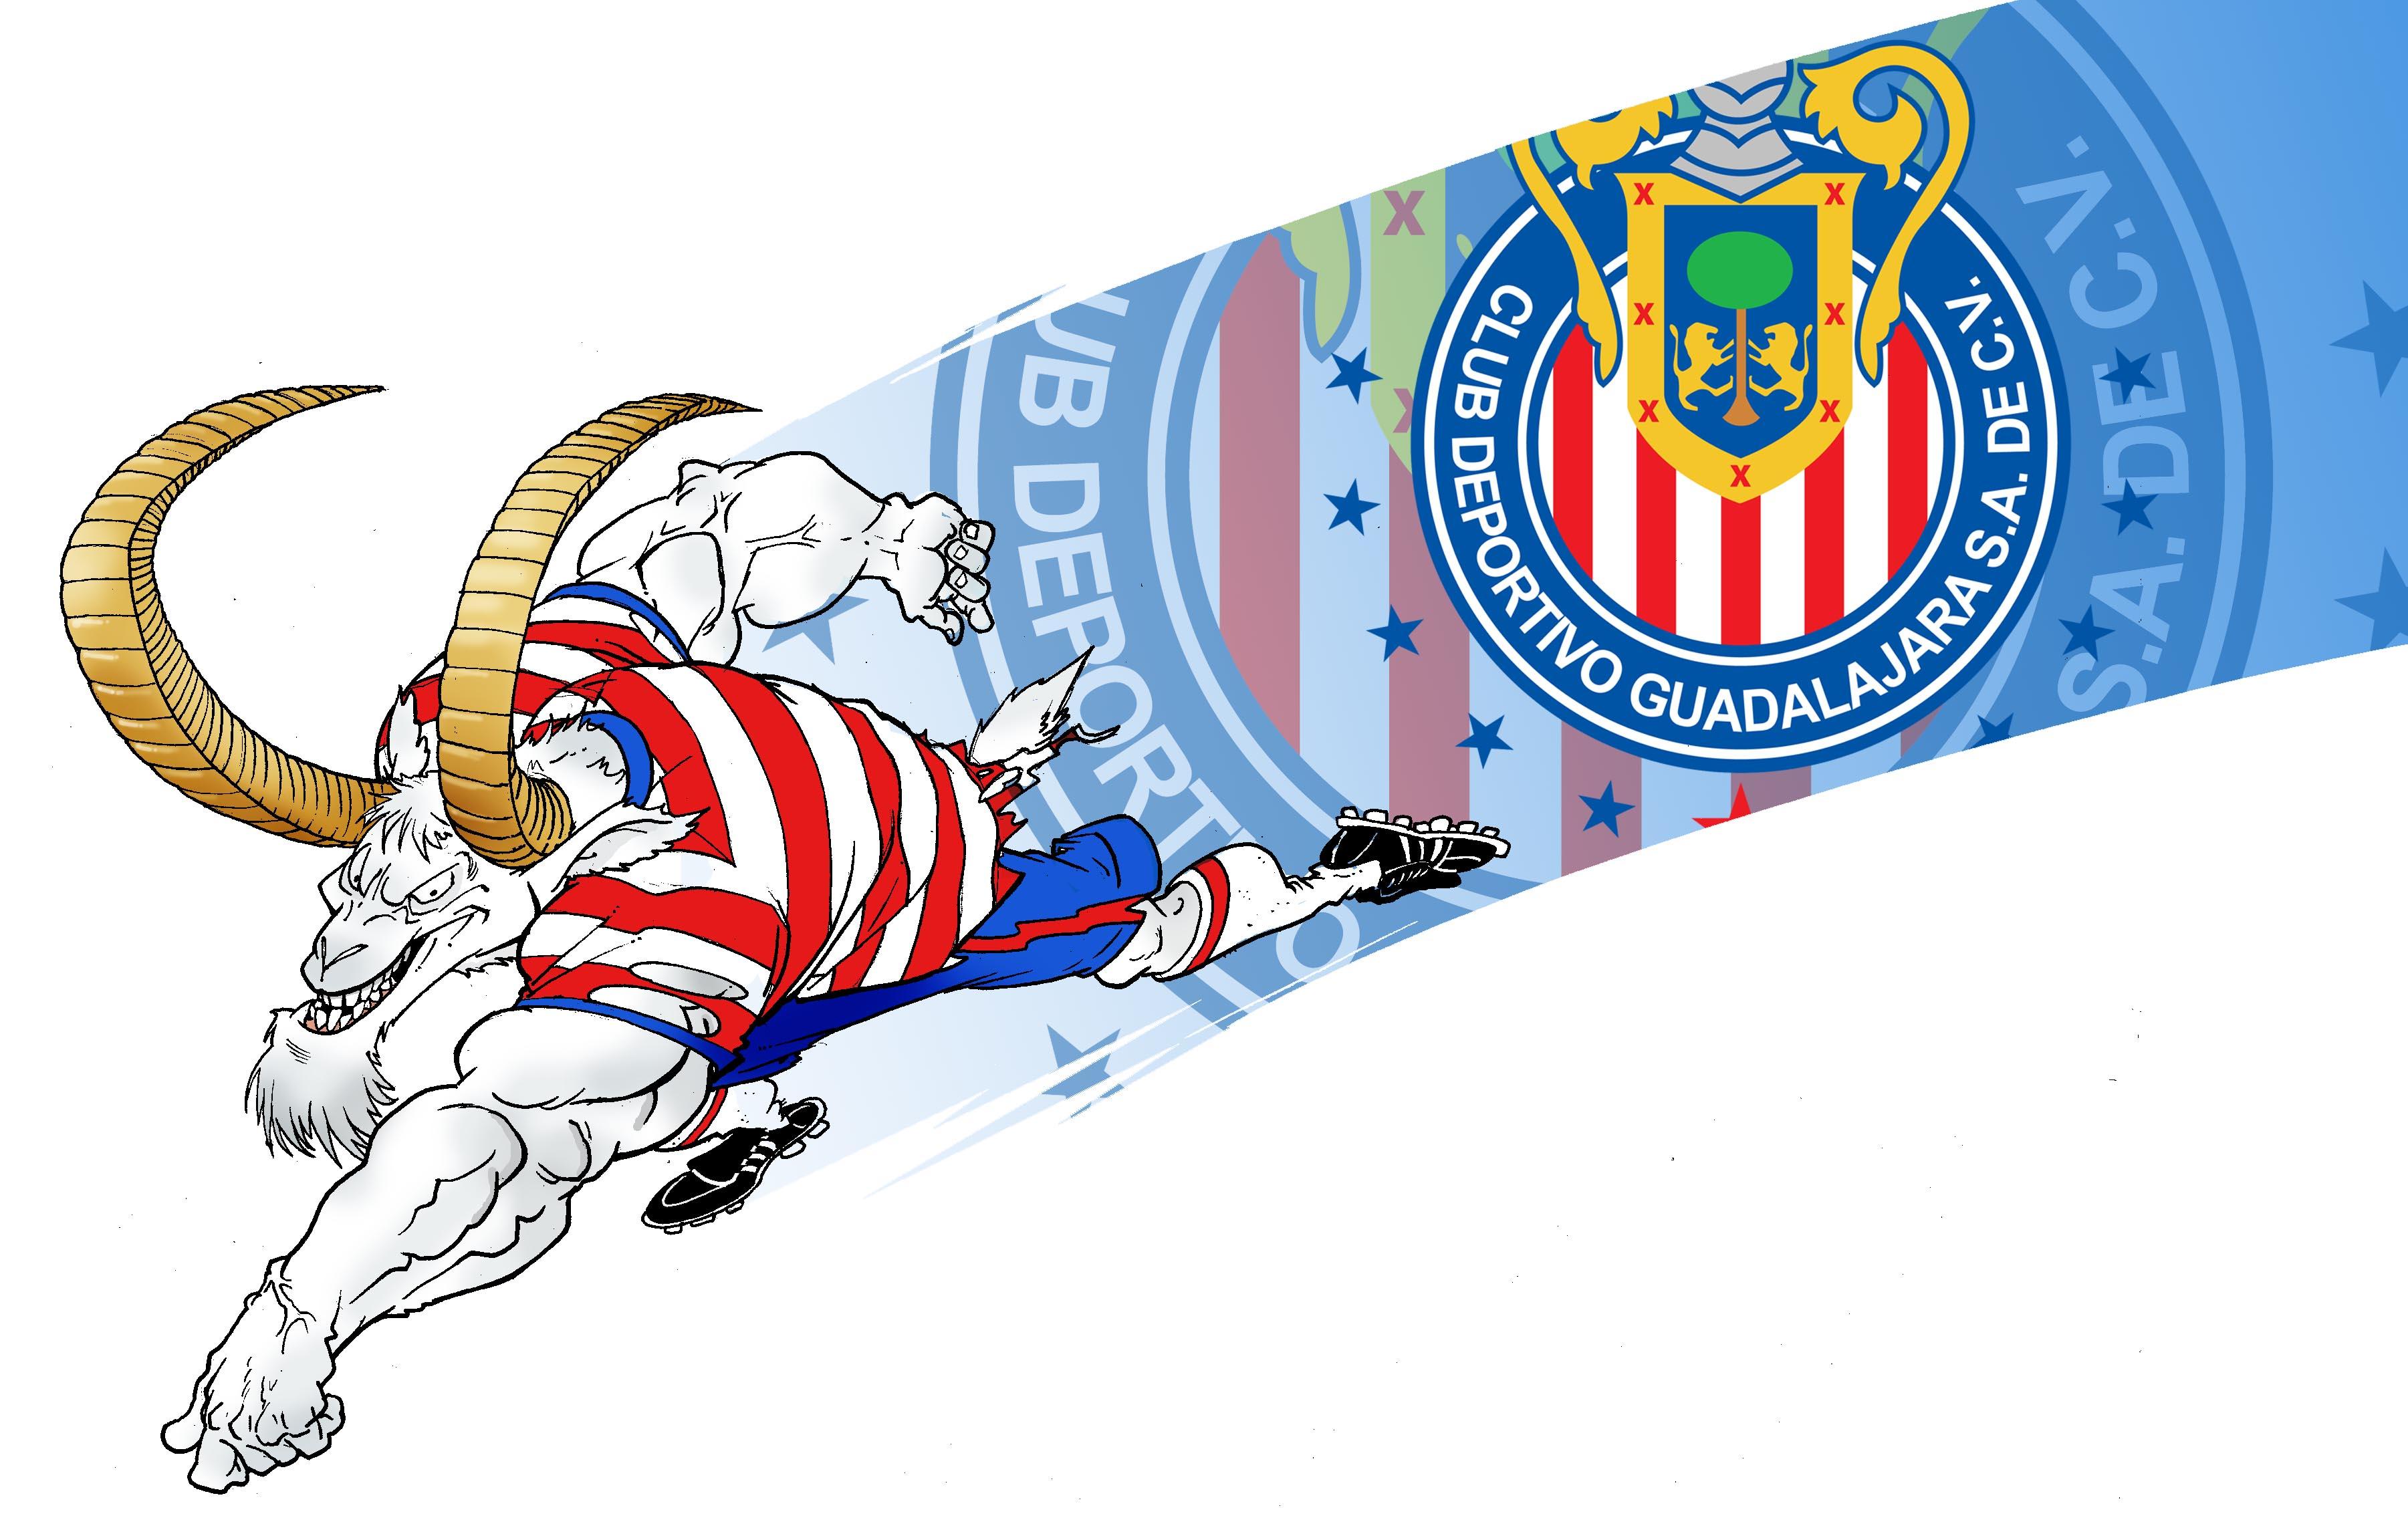 Chivas del Guadalajara by JAMES-cartoons